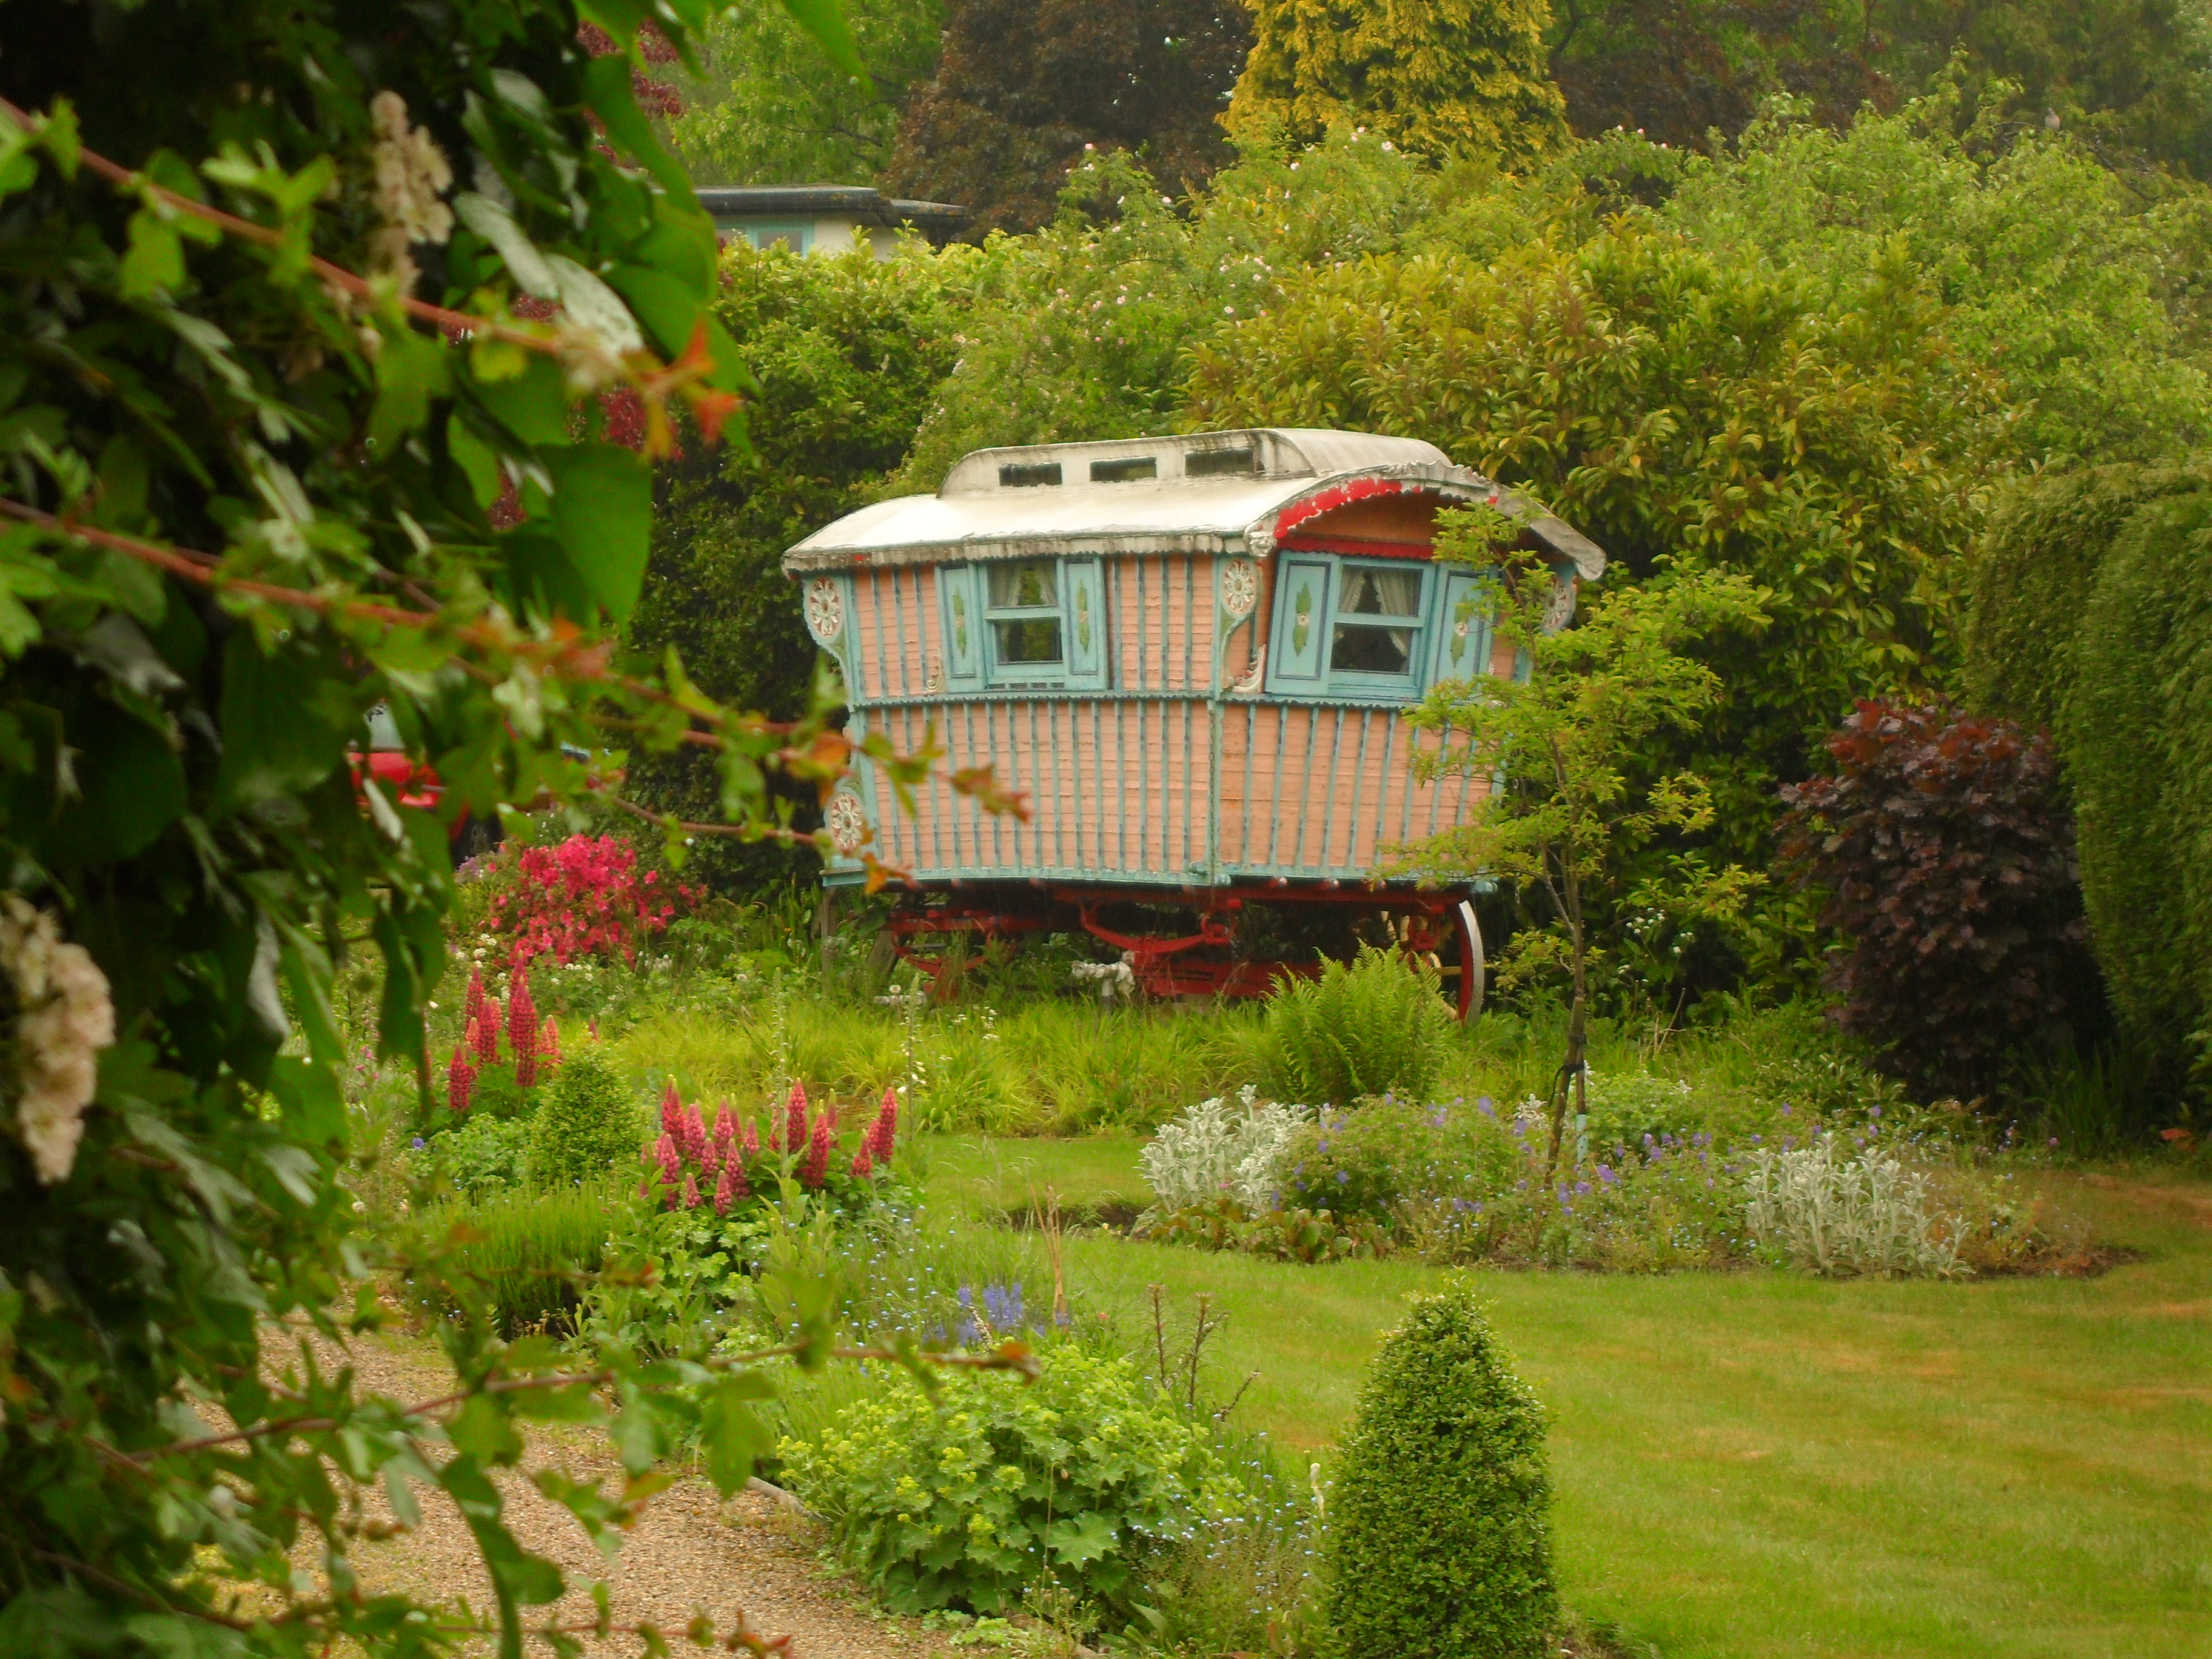 Gypsy Garden By Adonimiah On Deviantart